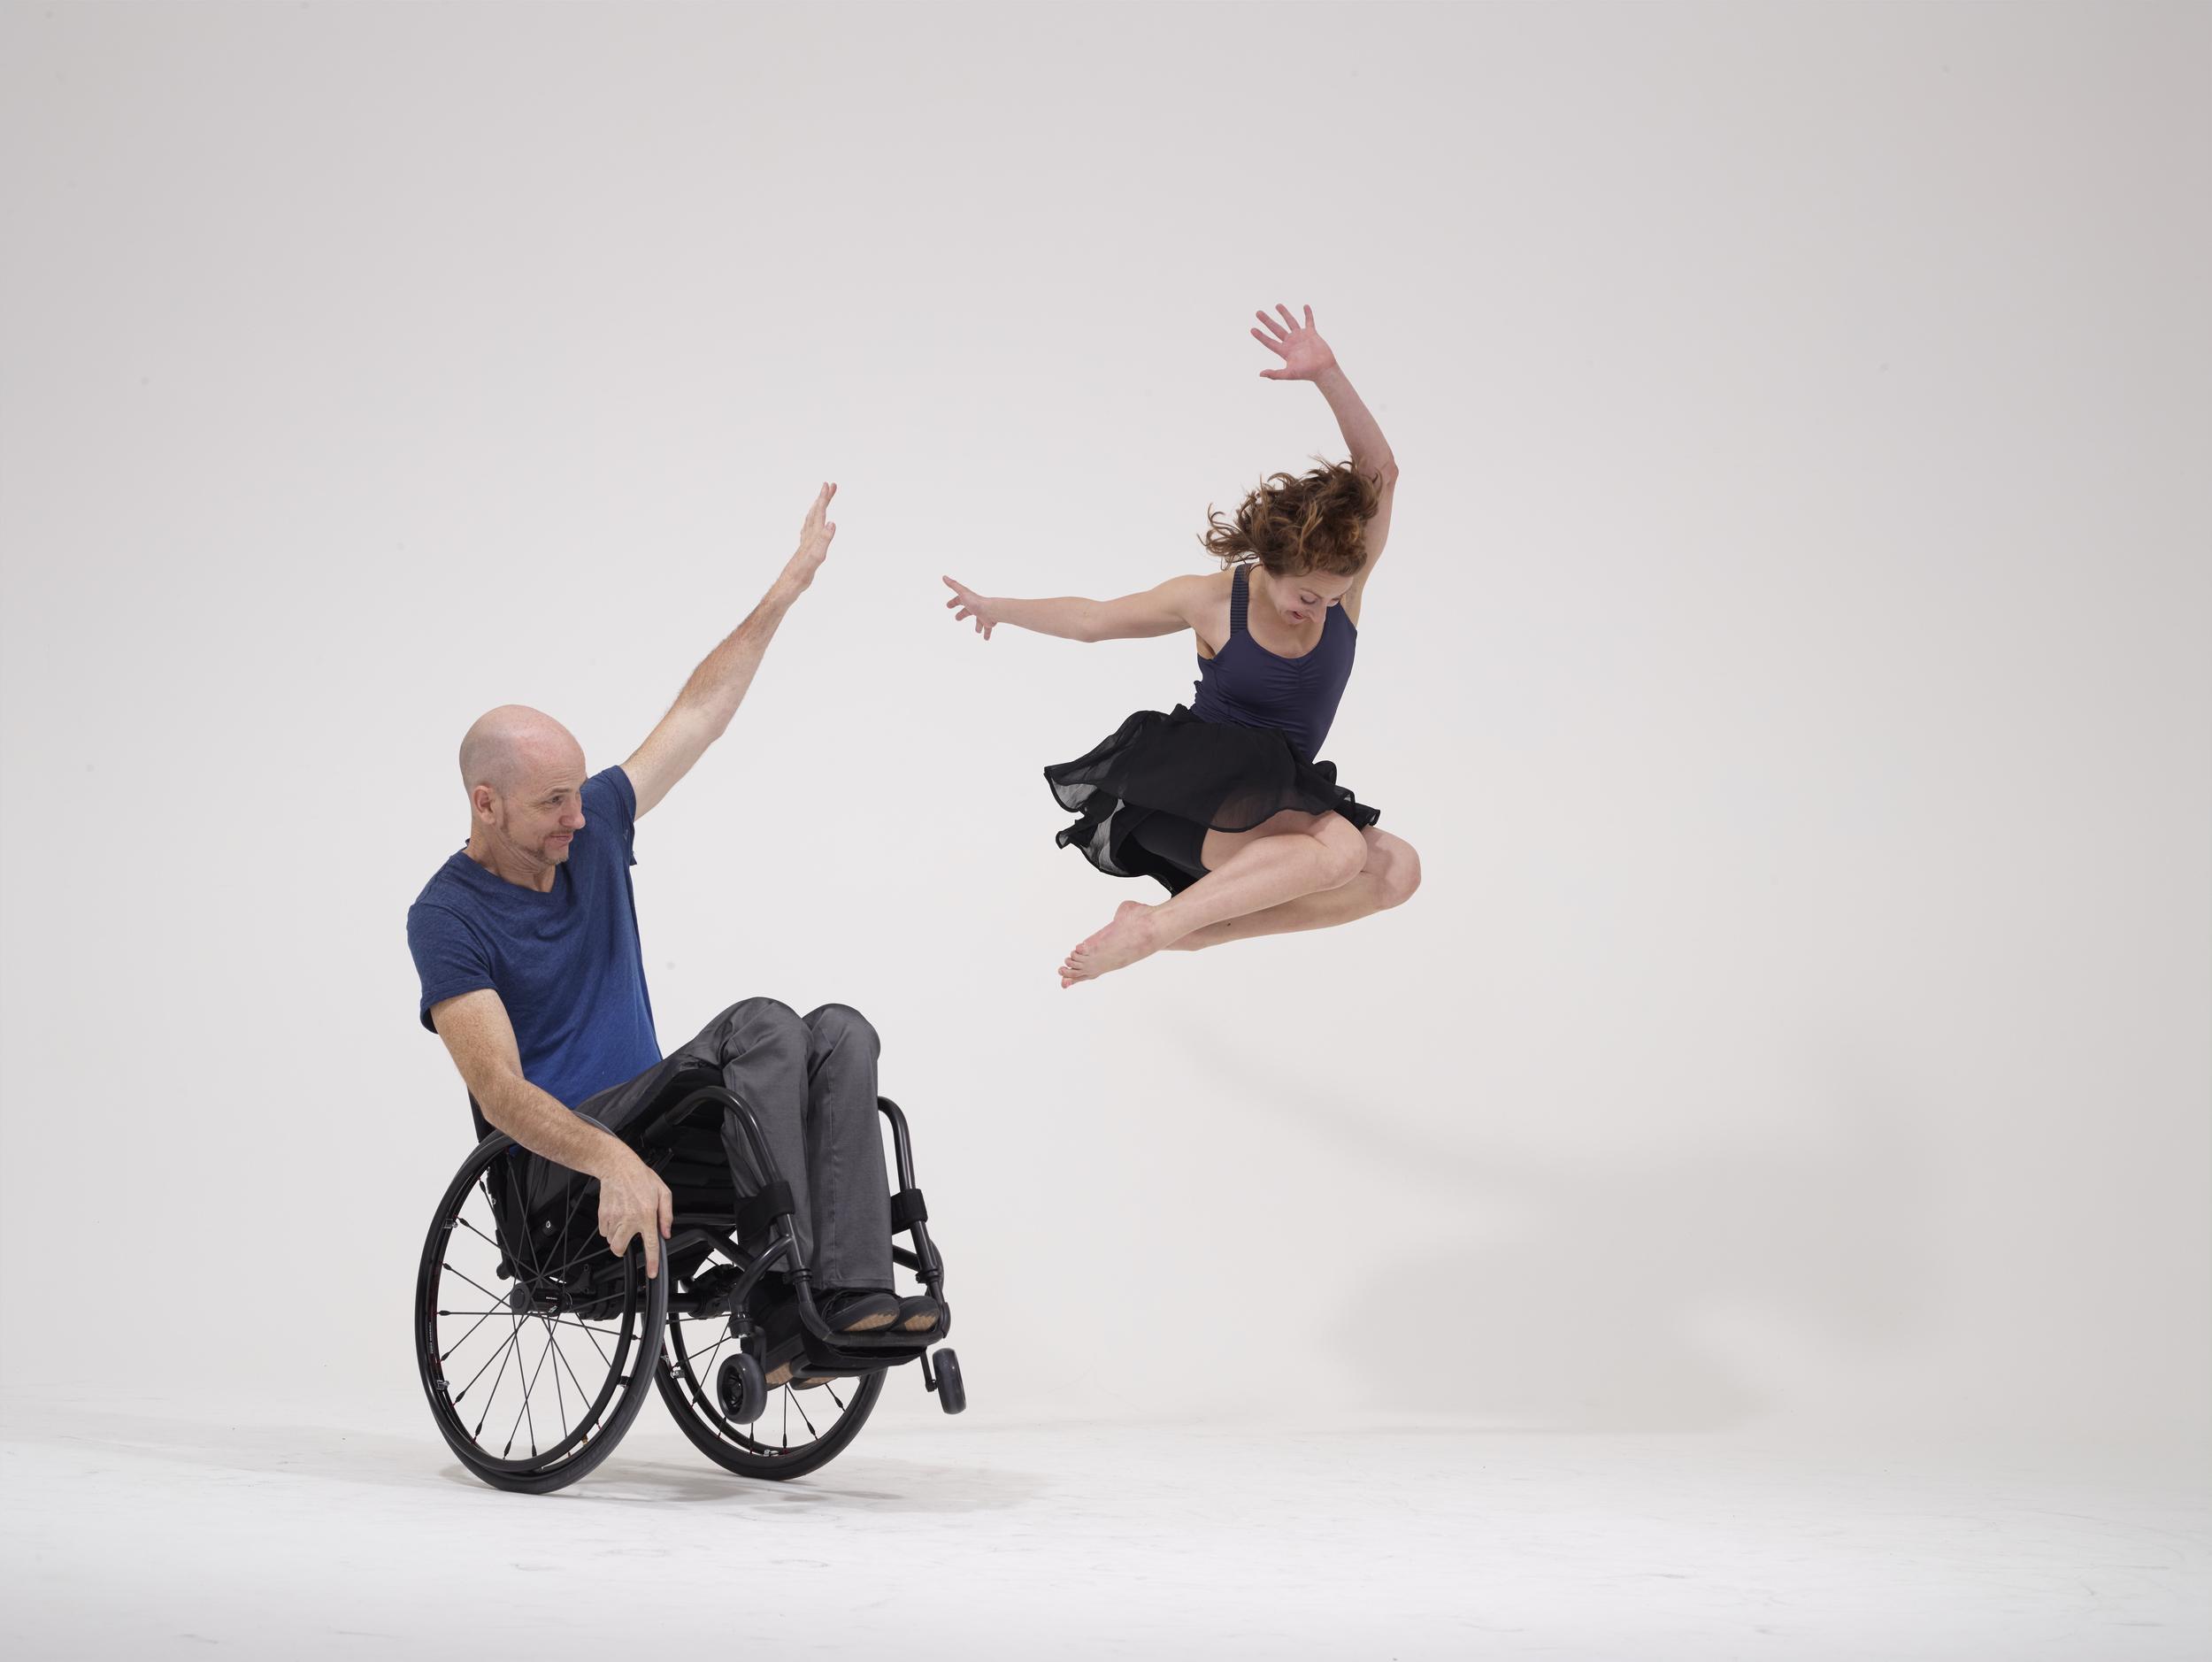 AXIS+Dance+Company+2015.+Dwayne+and+Sophie.+Photo+by+David+DeSilva.jpg